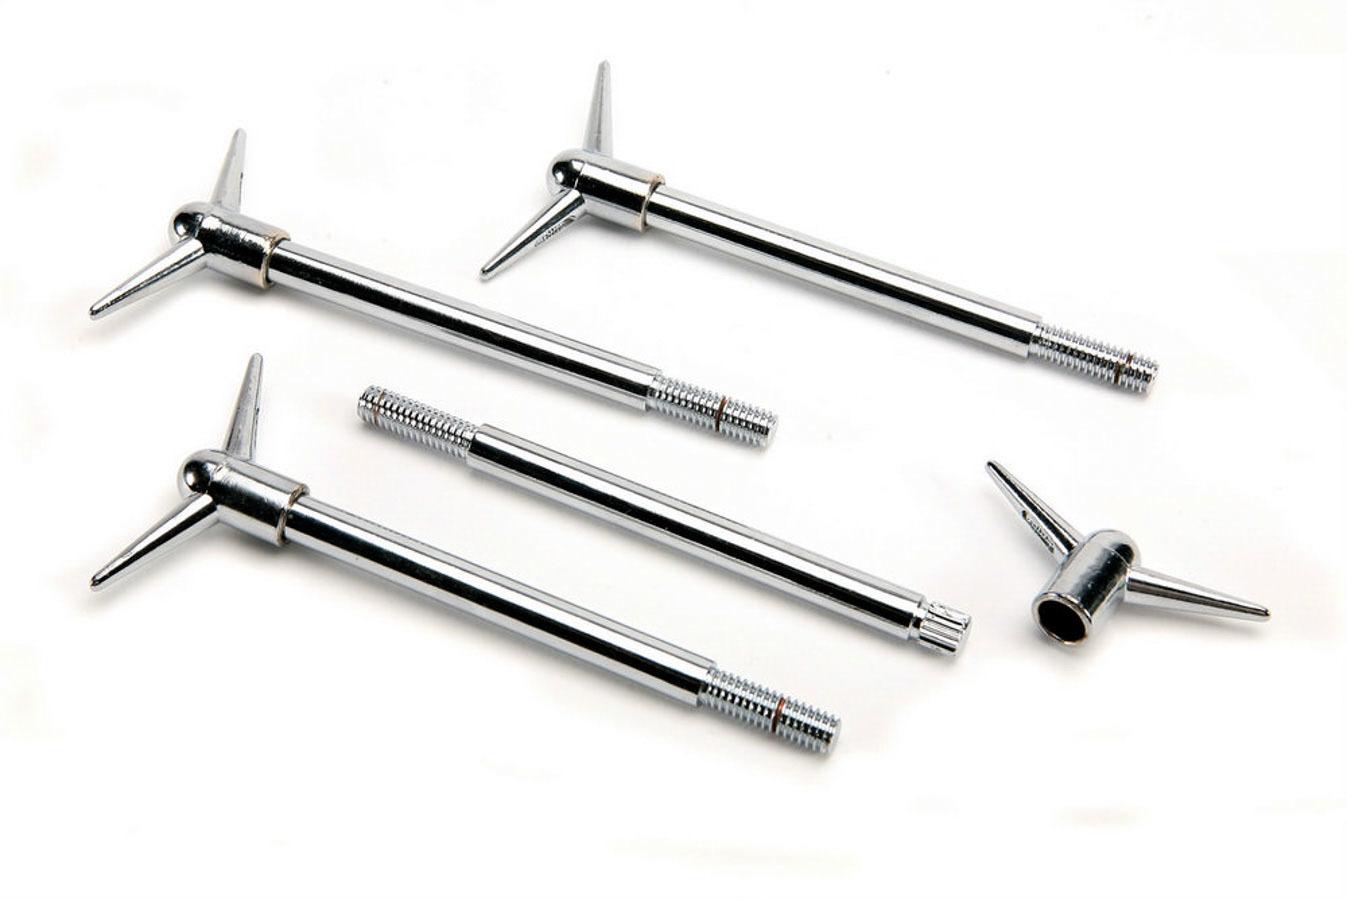 Mr Gasket 9829 Valve Cover Fastener, Standard, Bolt, 5/16-18 in Thread, 5.750 in Long, Wing Head, Steel, Chrome, Set of 4